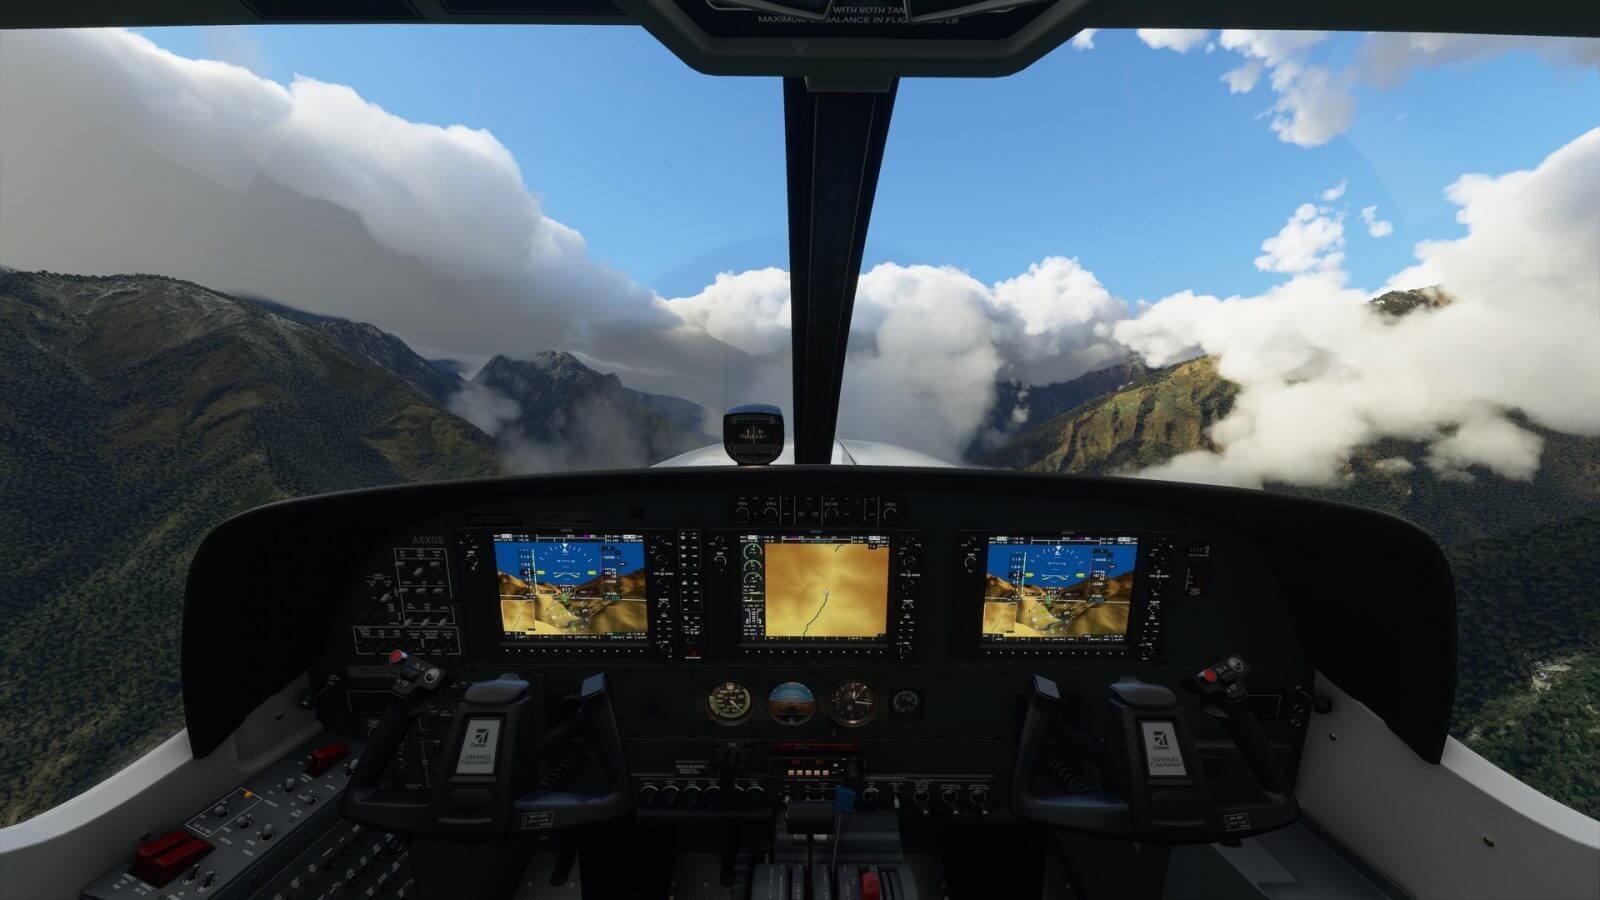 Microsoft Flight Simulator 2020 cockpit scene